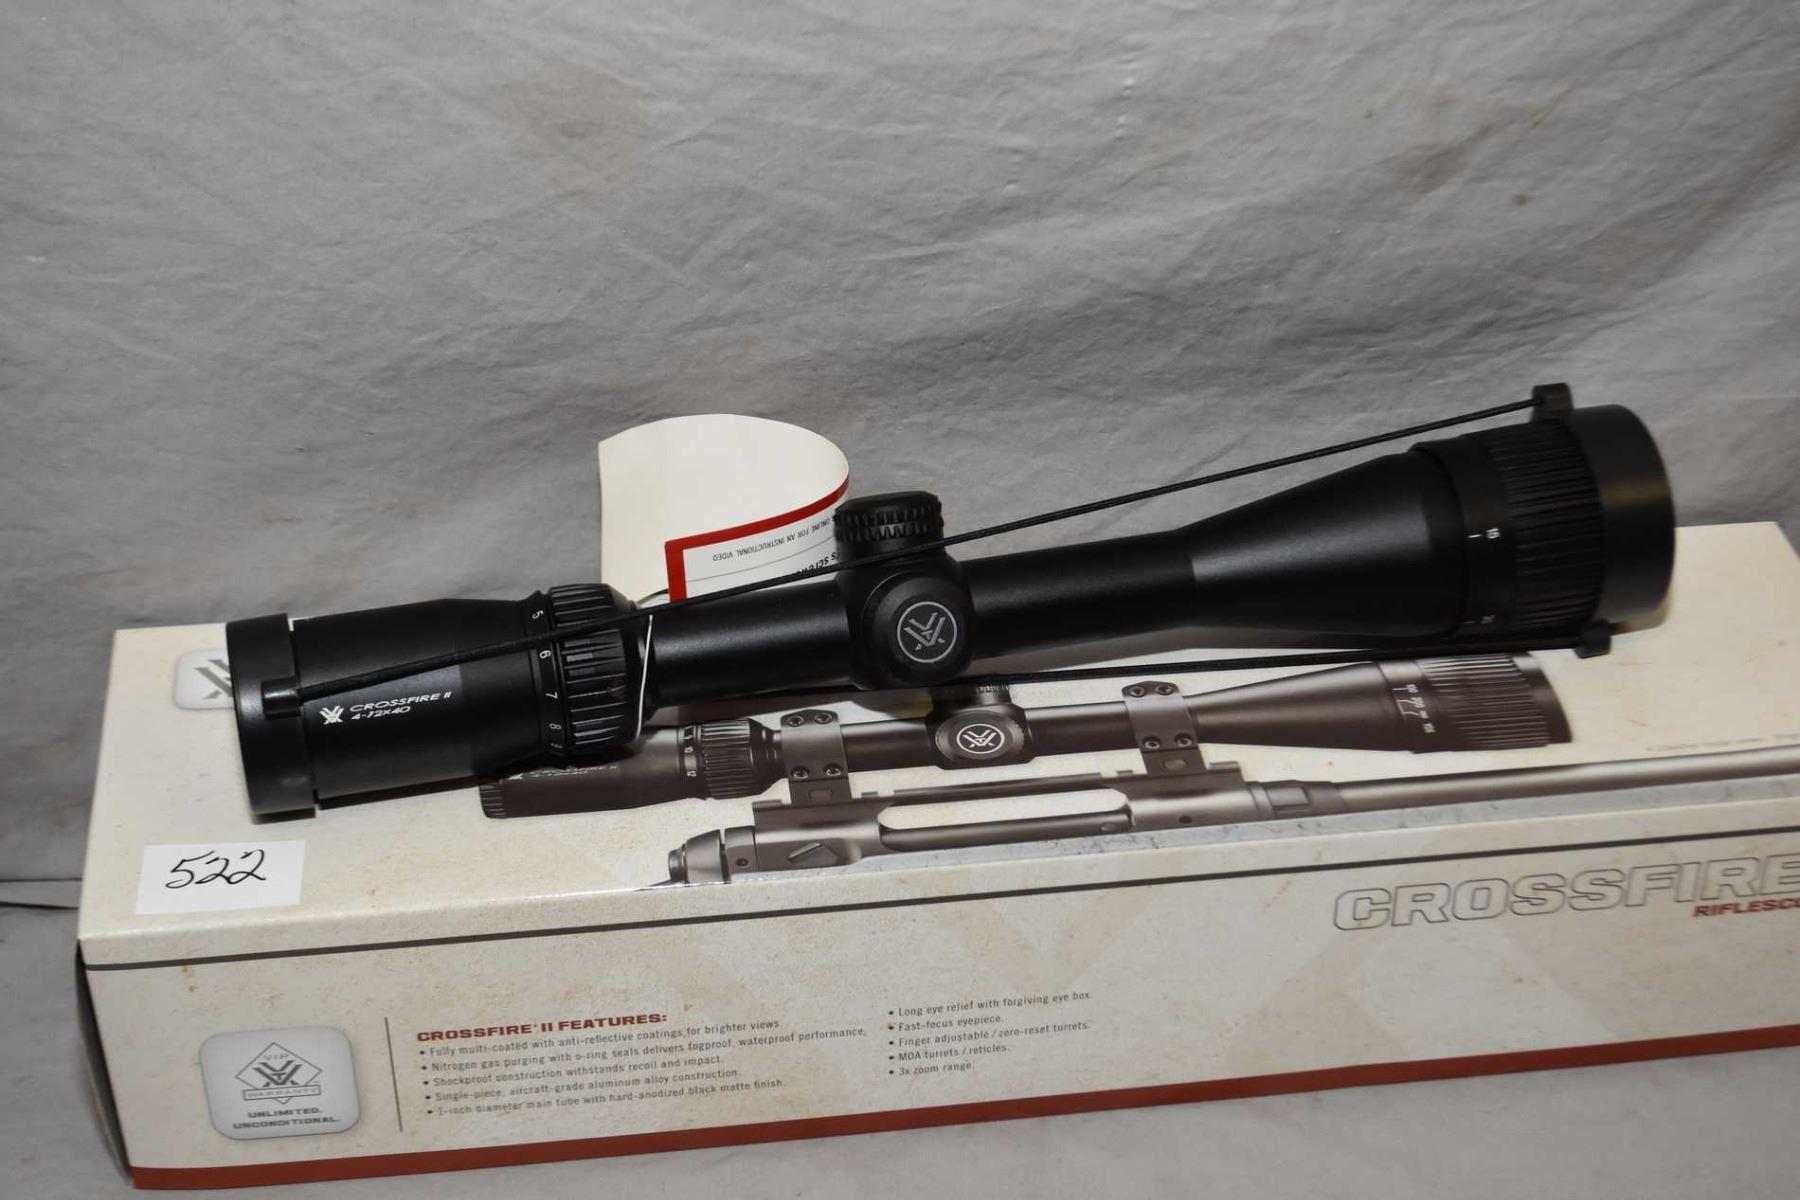 Vortex Crossfire II Rifle Scope ( CF 2 - 31017 ) 4 x - 12 Power